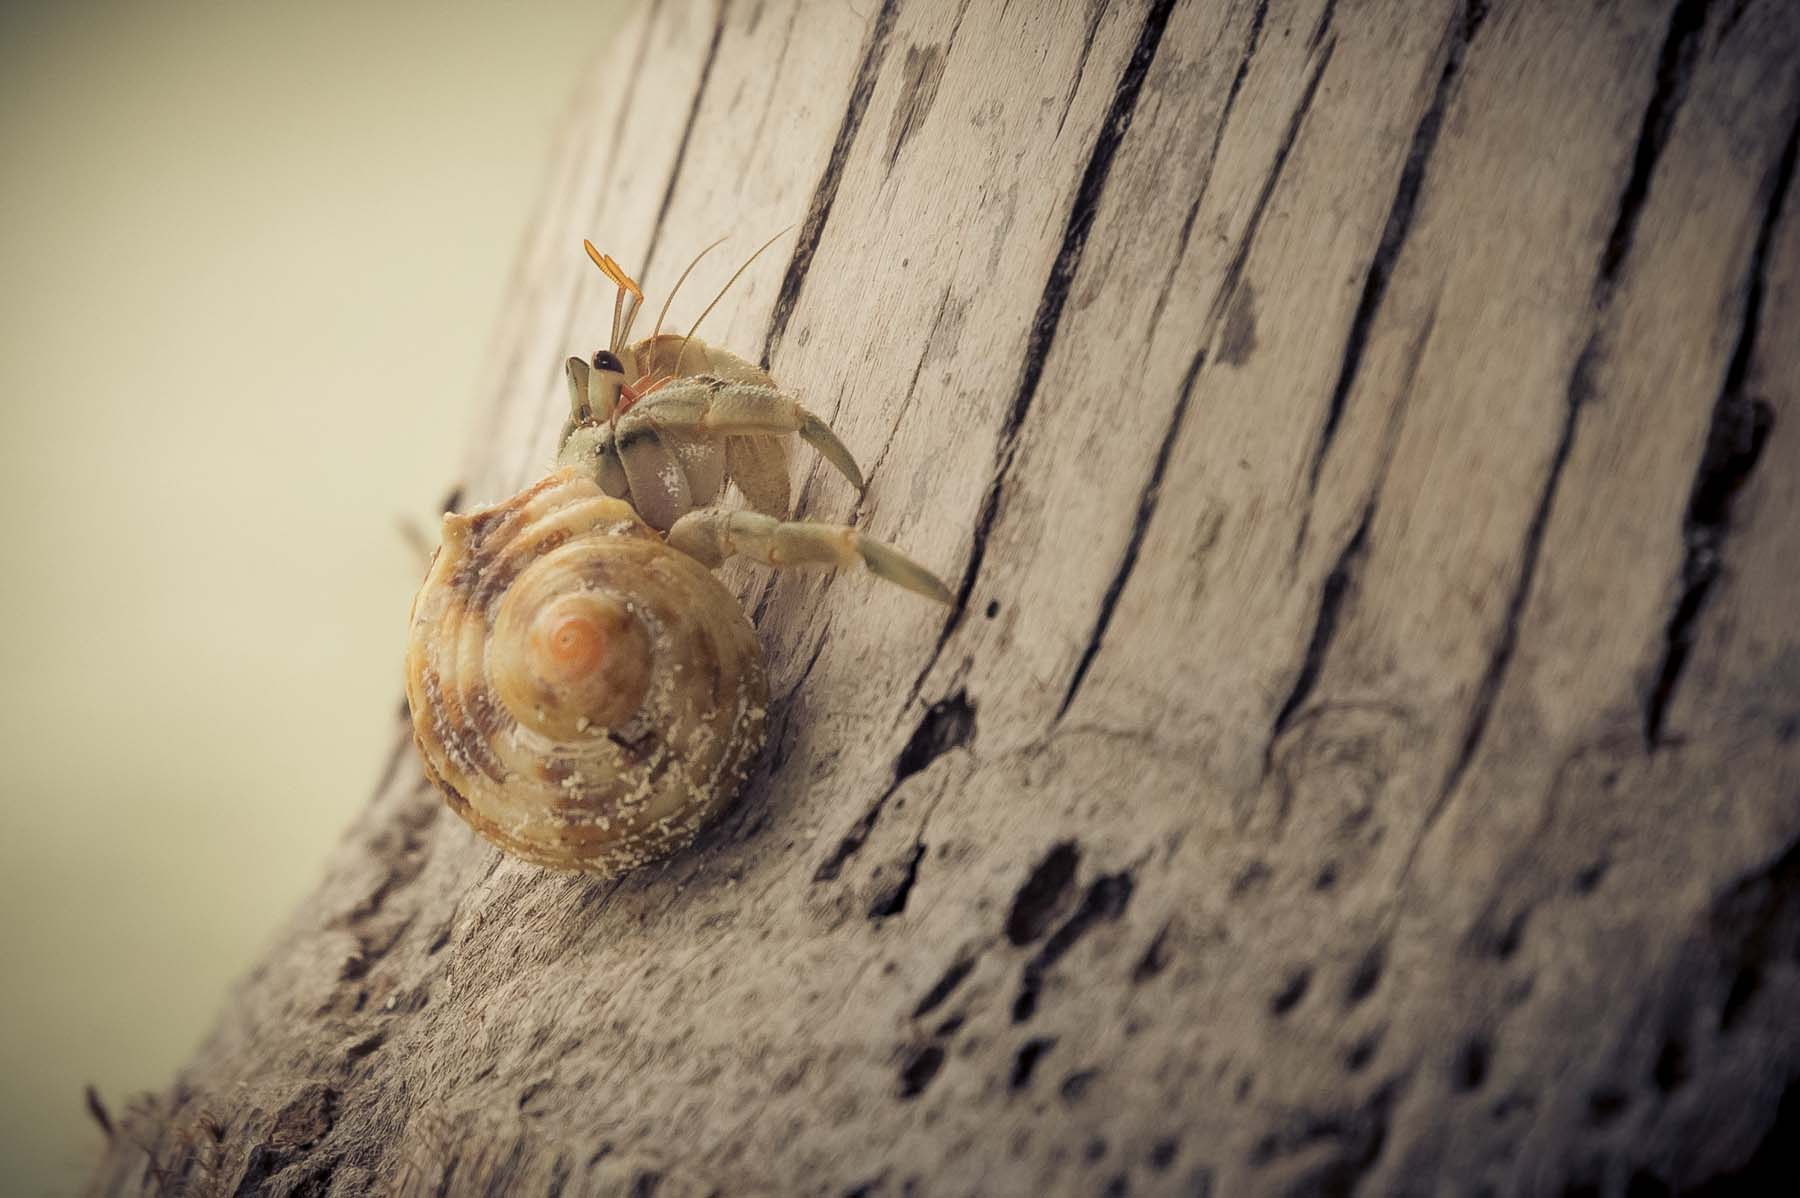 tree climbing hermit crab